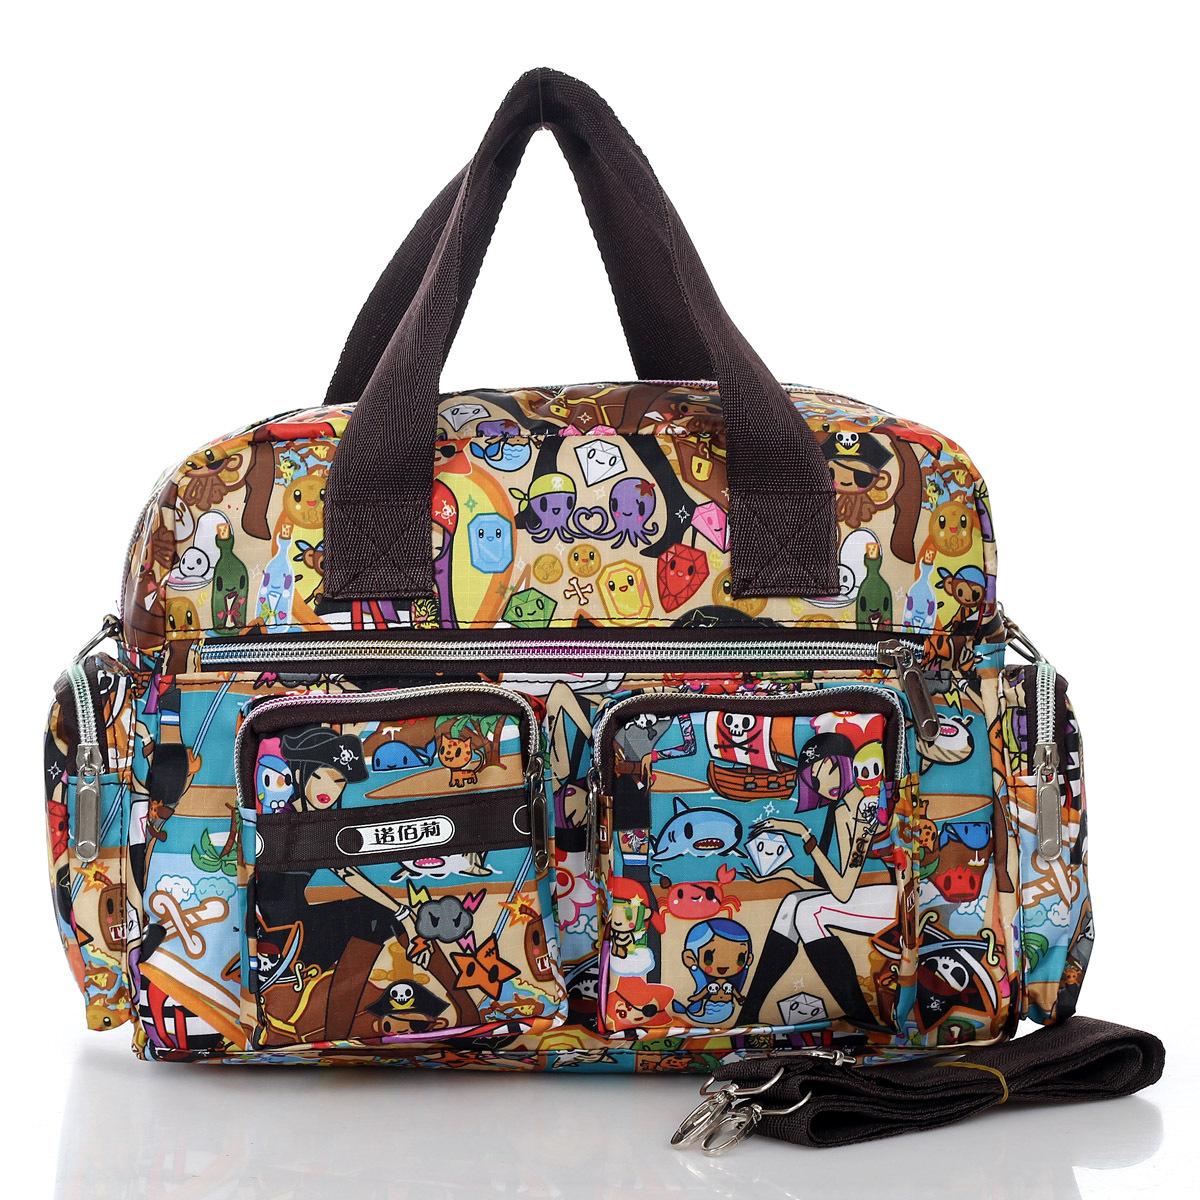 Flower waterproof nylon fabric handbag shoulder bag messenger bag women's handbag nappy bag(China (Mainland))